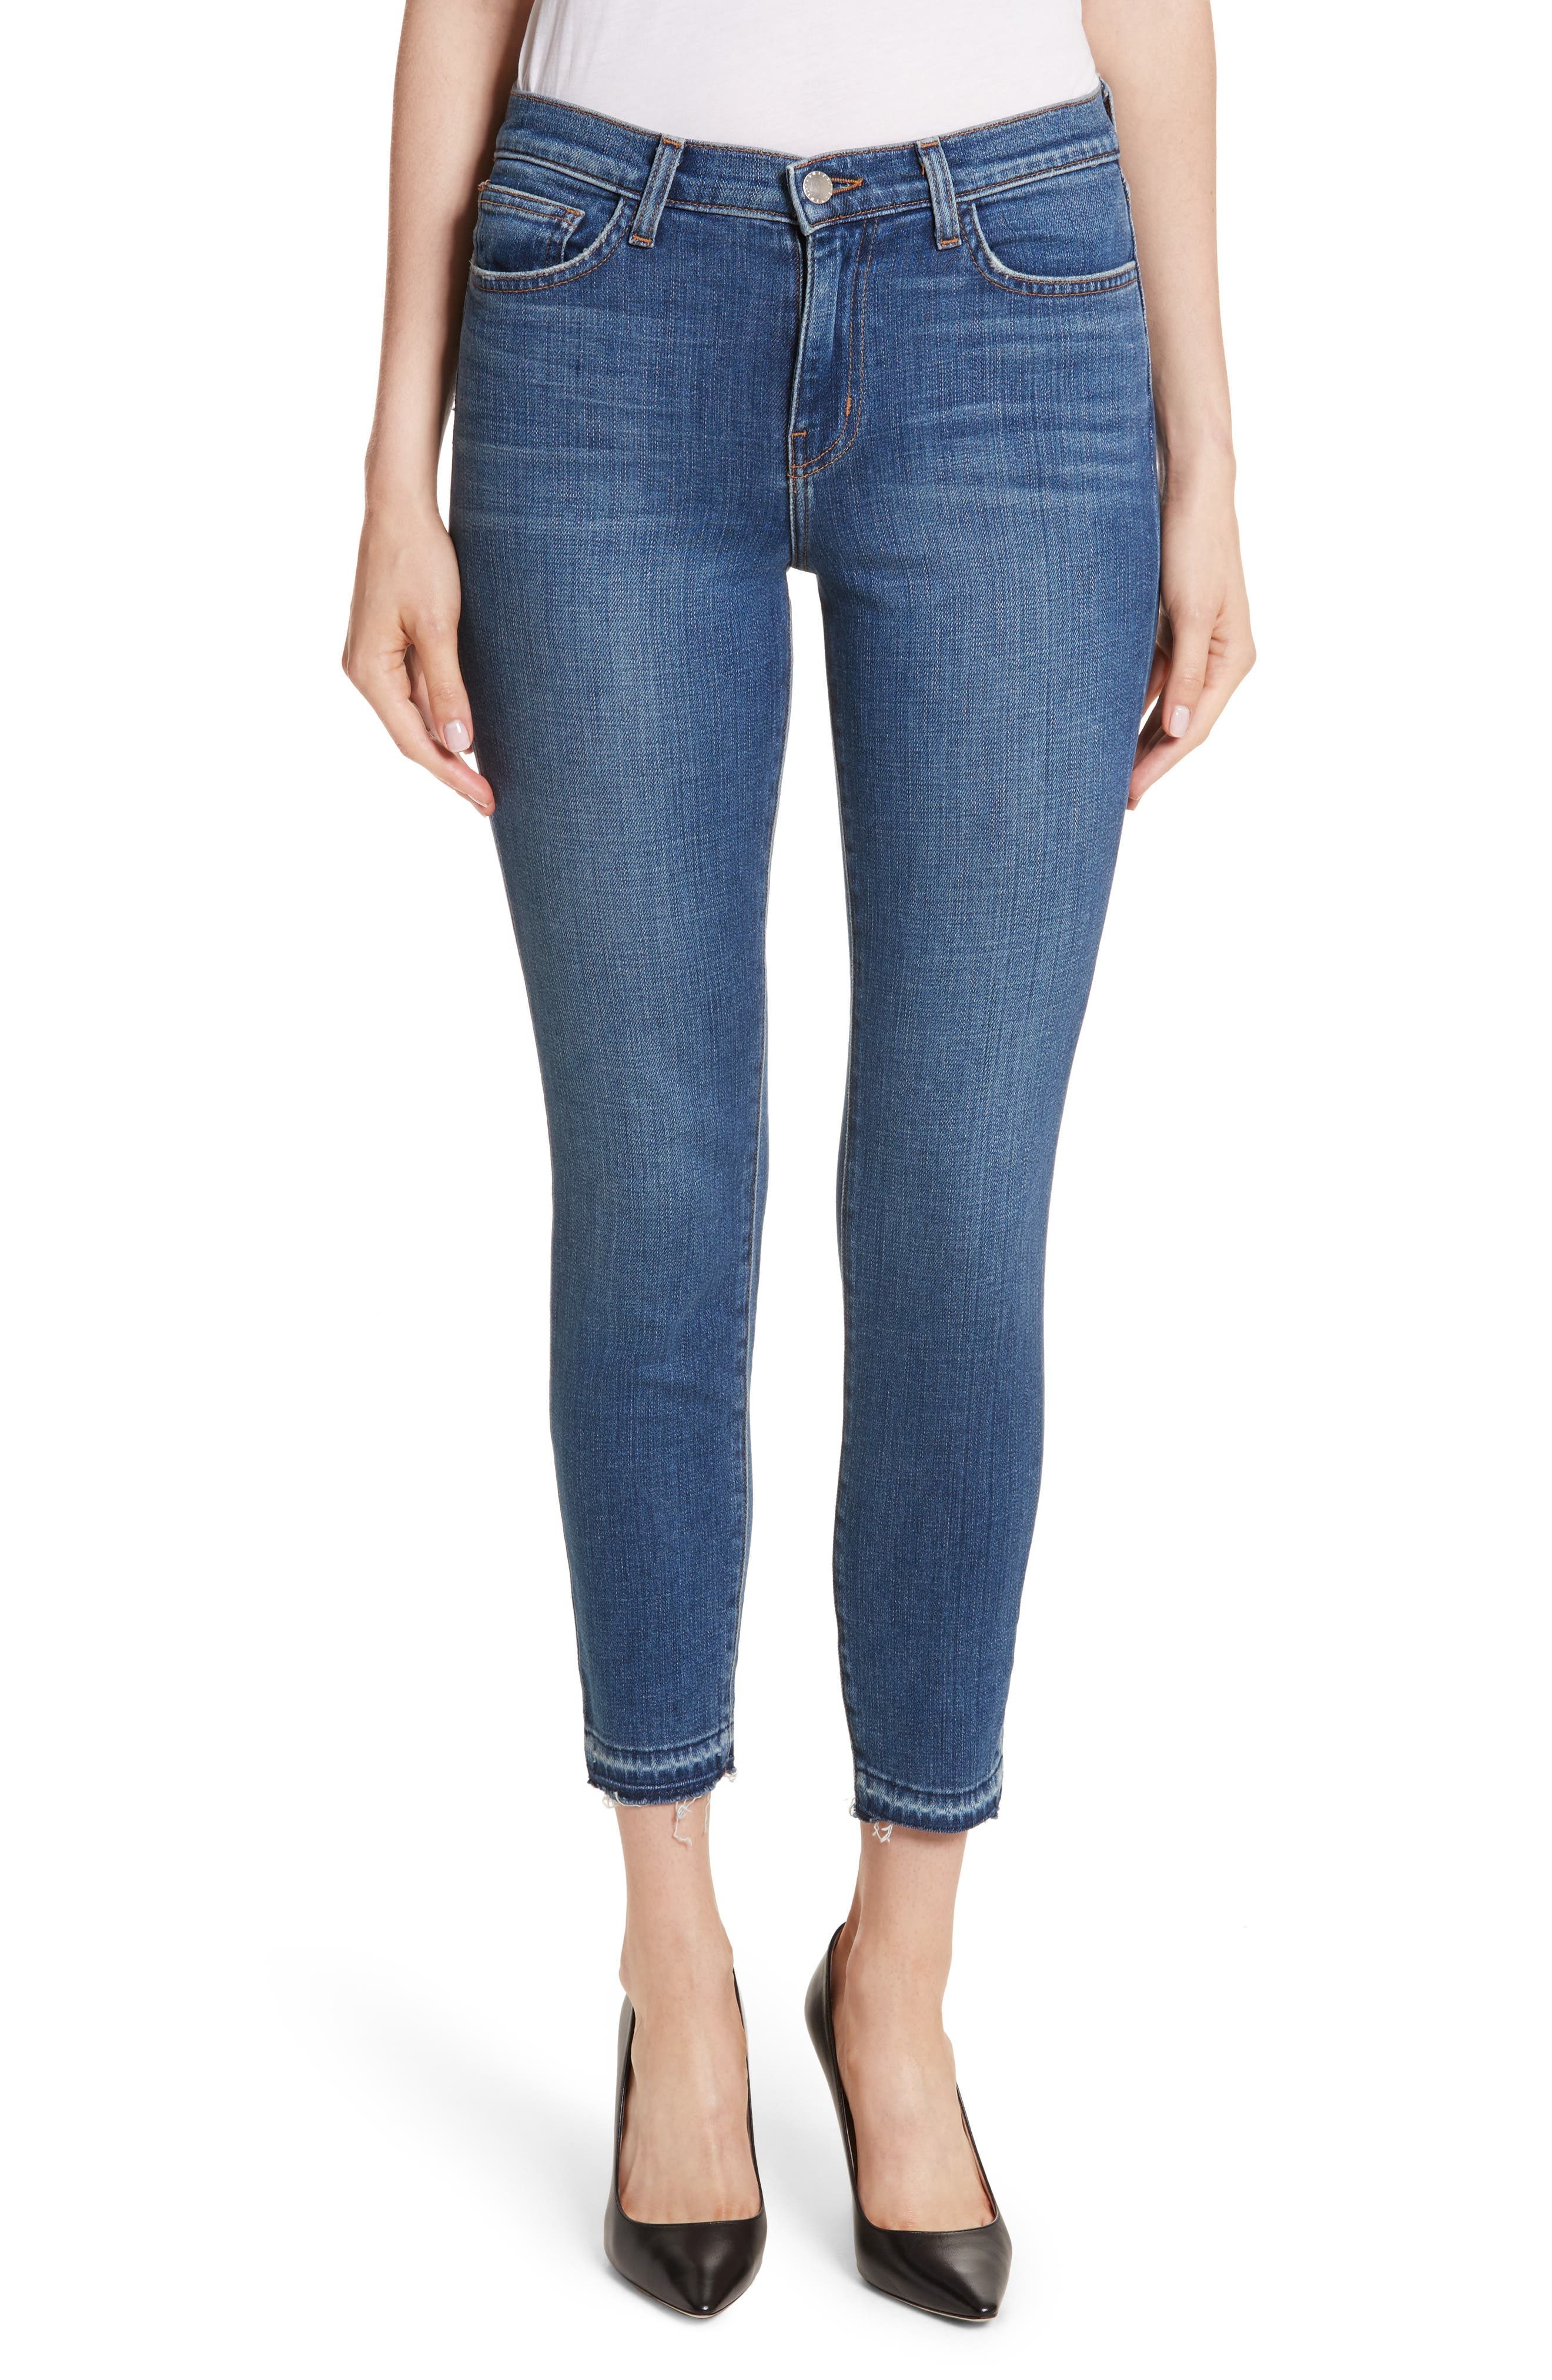 Laguna French High Waist Release Hem Jeans,                         Main,                         color, Indigo